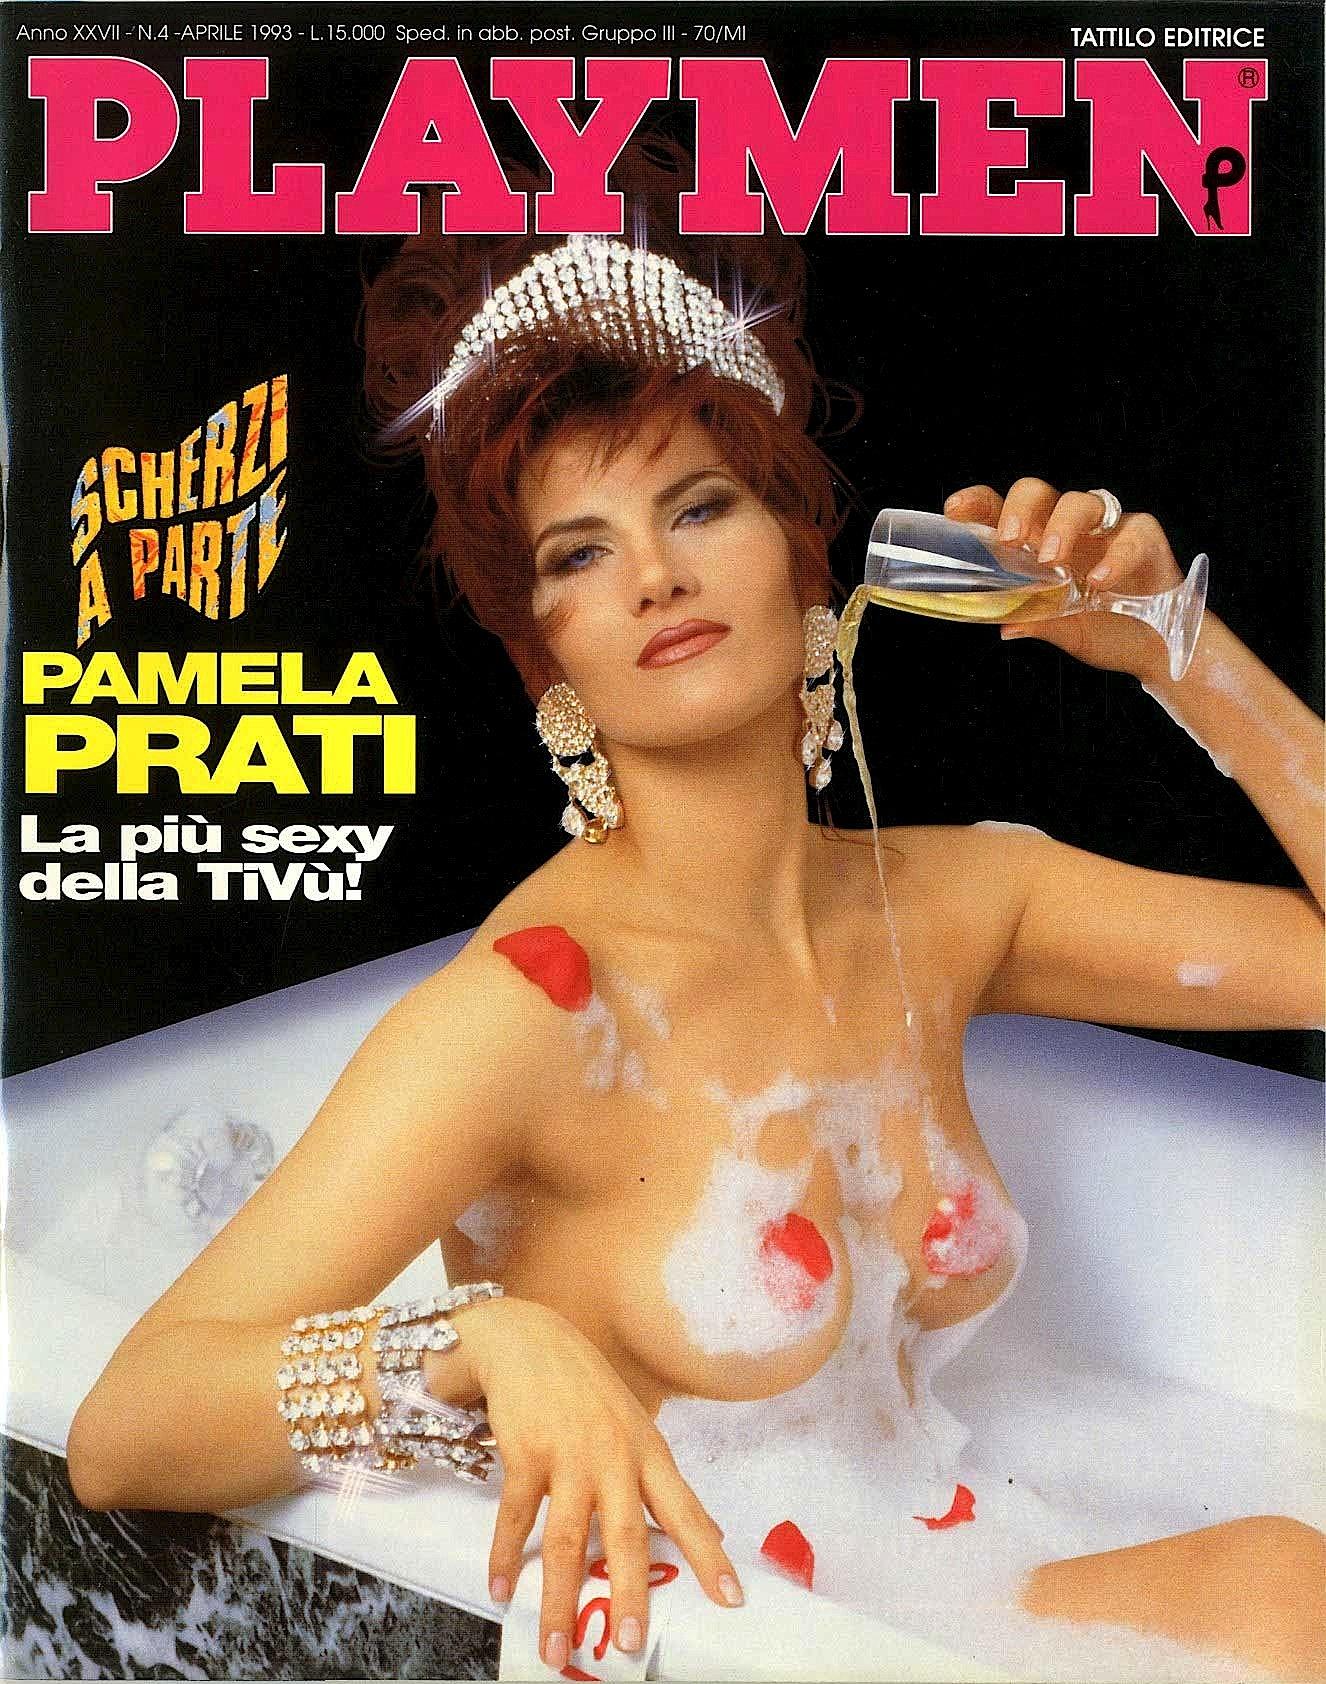 PLAYMEN-1993_pamela_prati